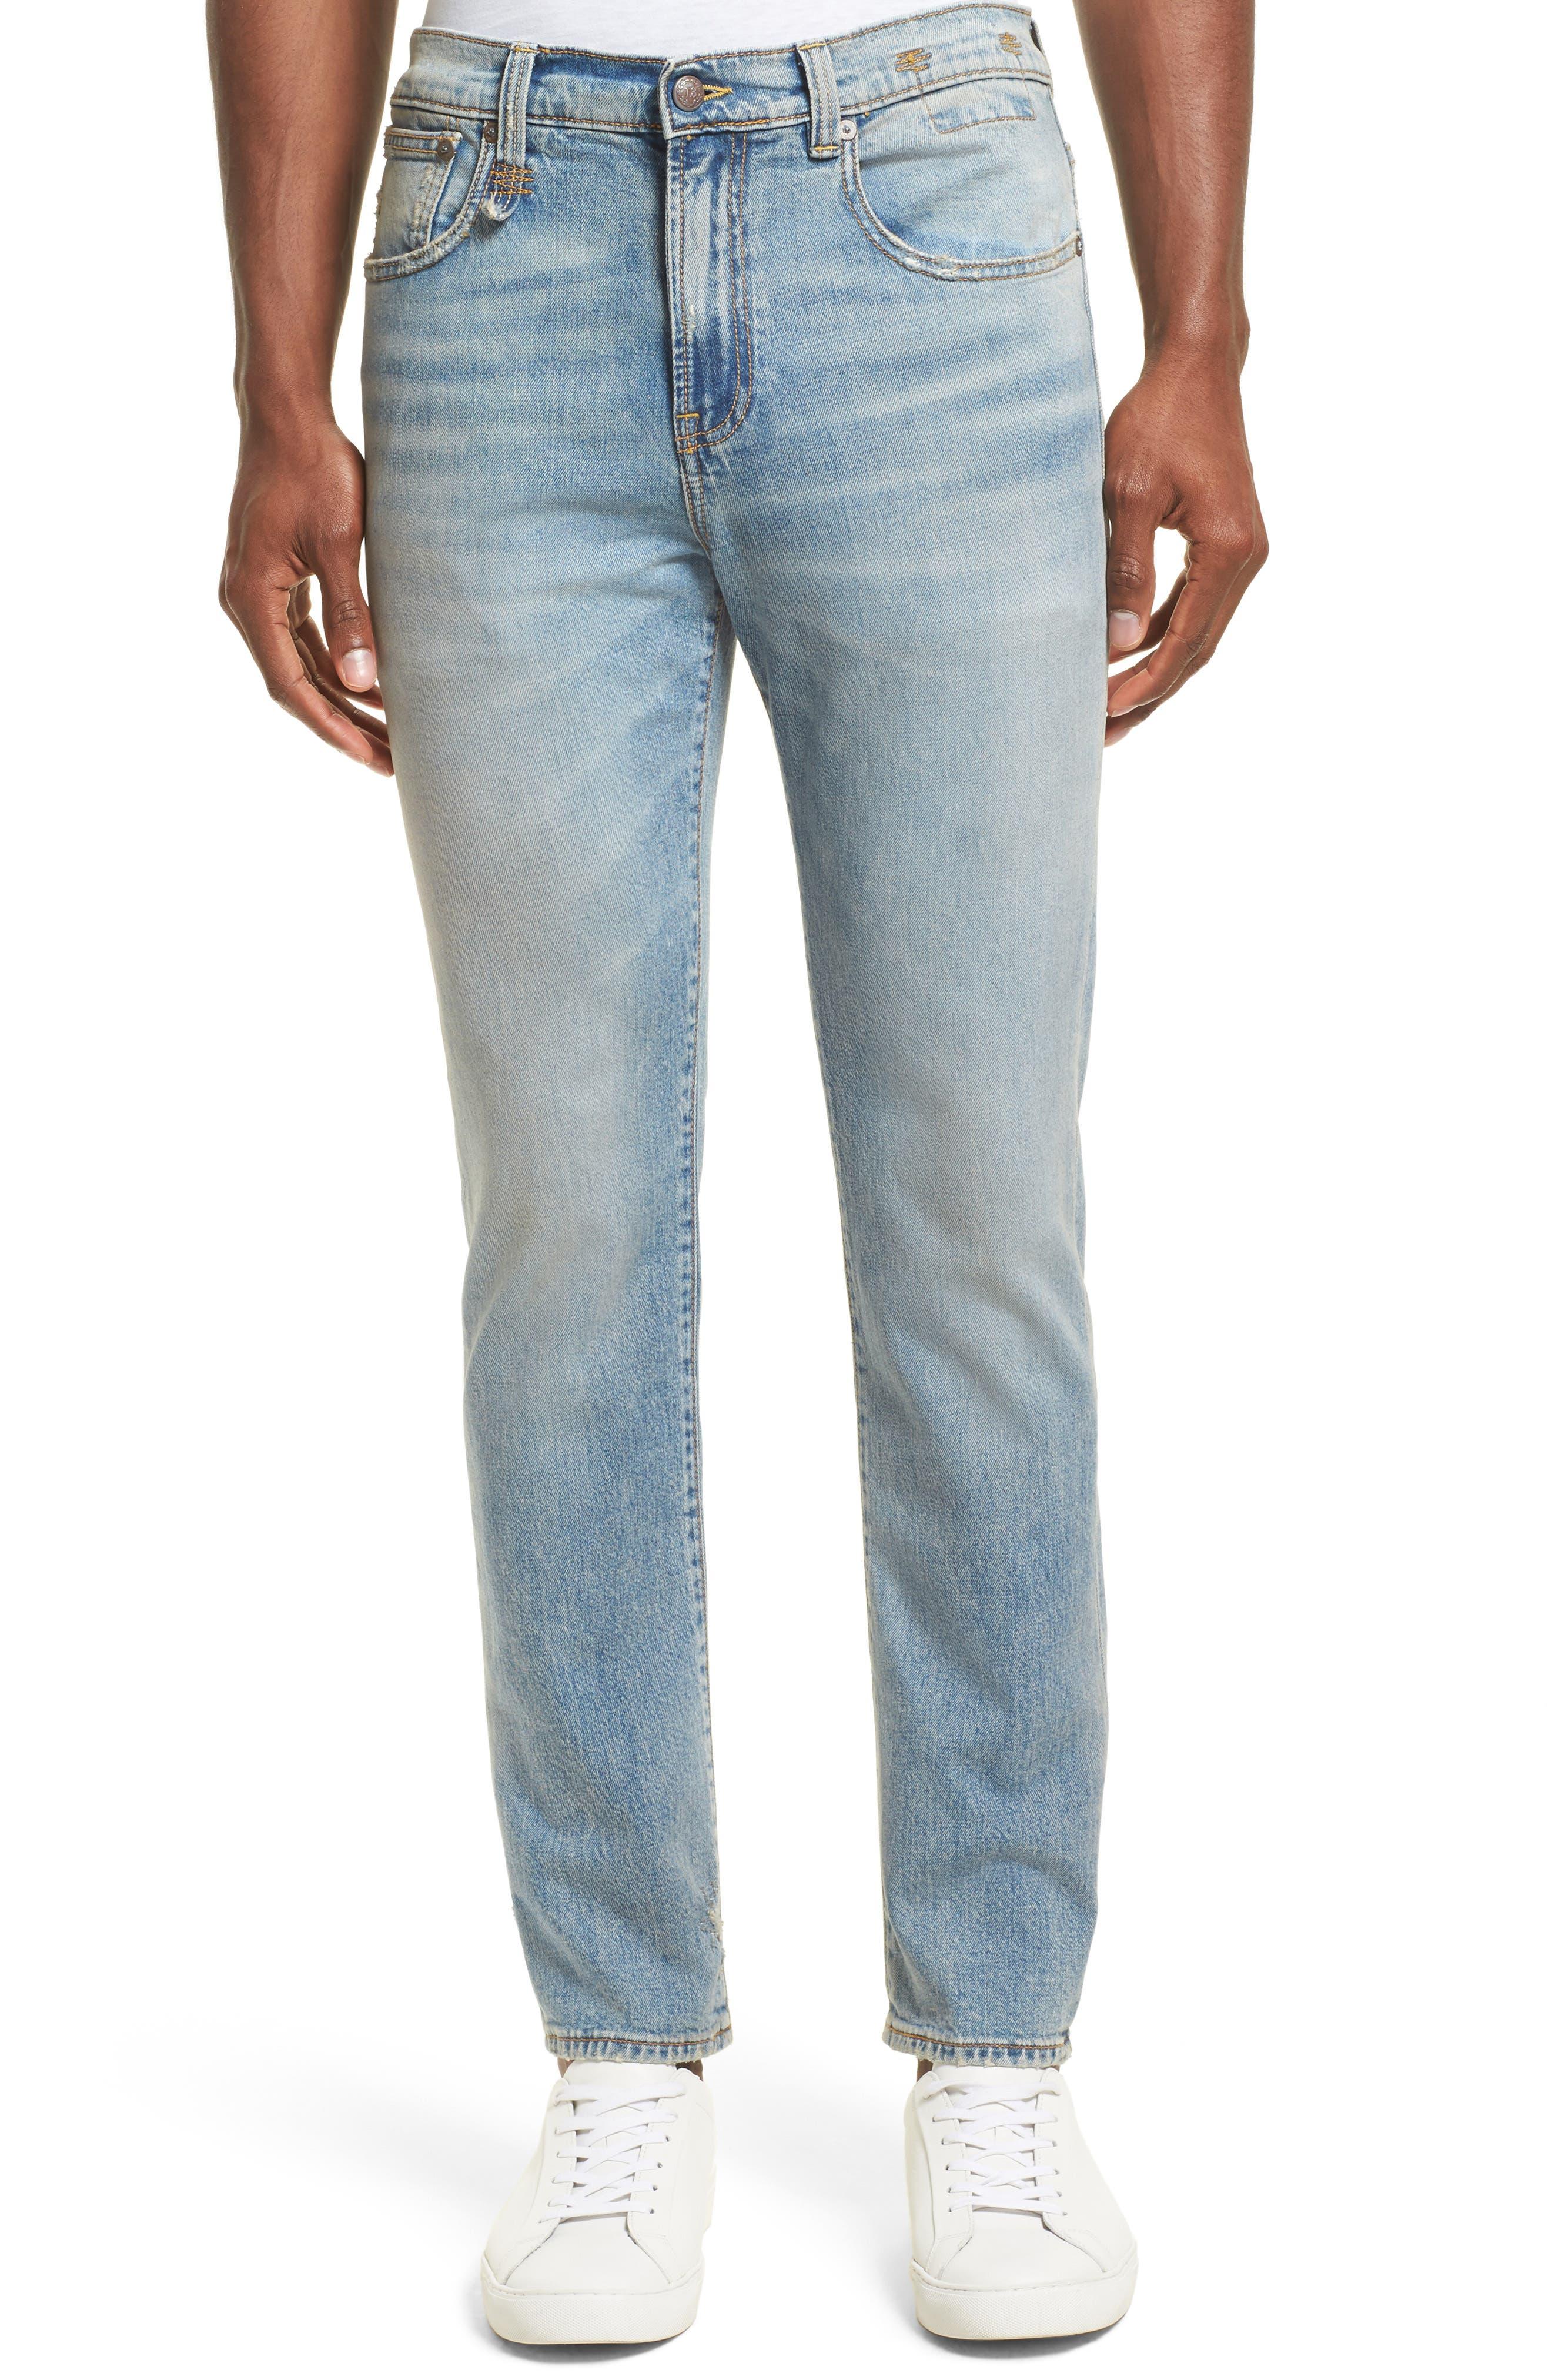 Alternate Image 1 Selected - R13 Boy Clean Jeans (Leyton)